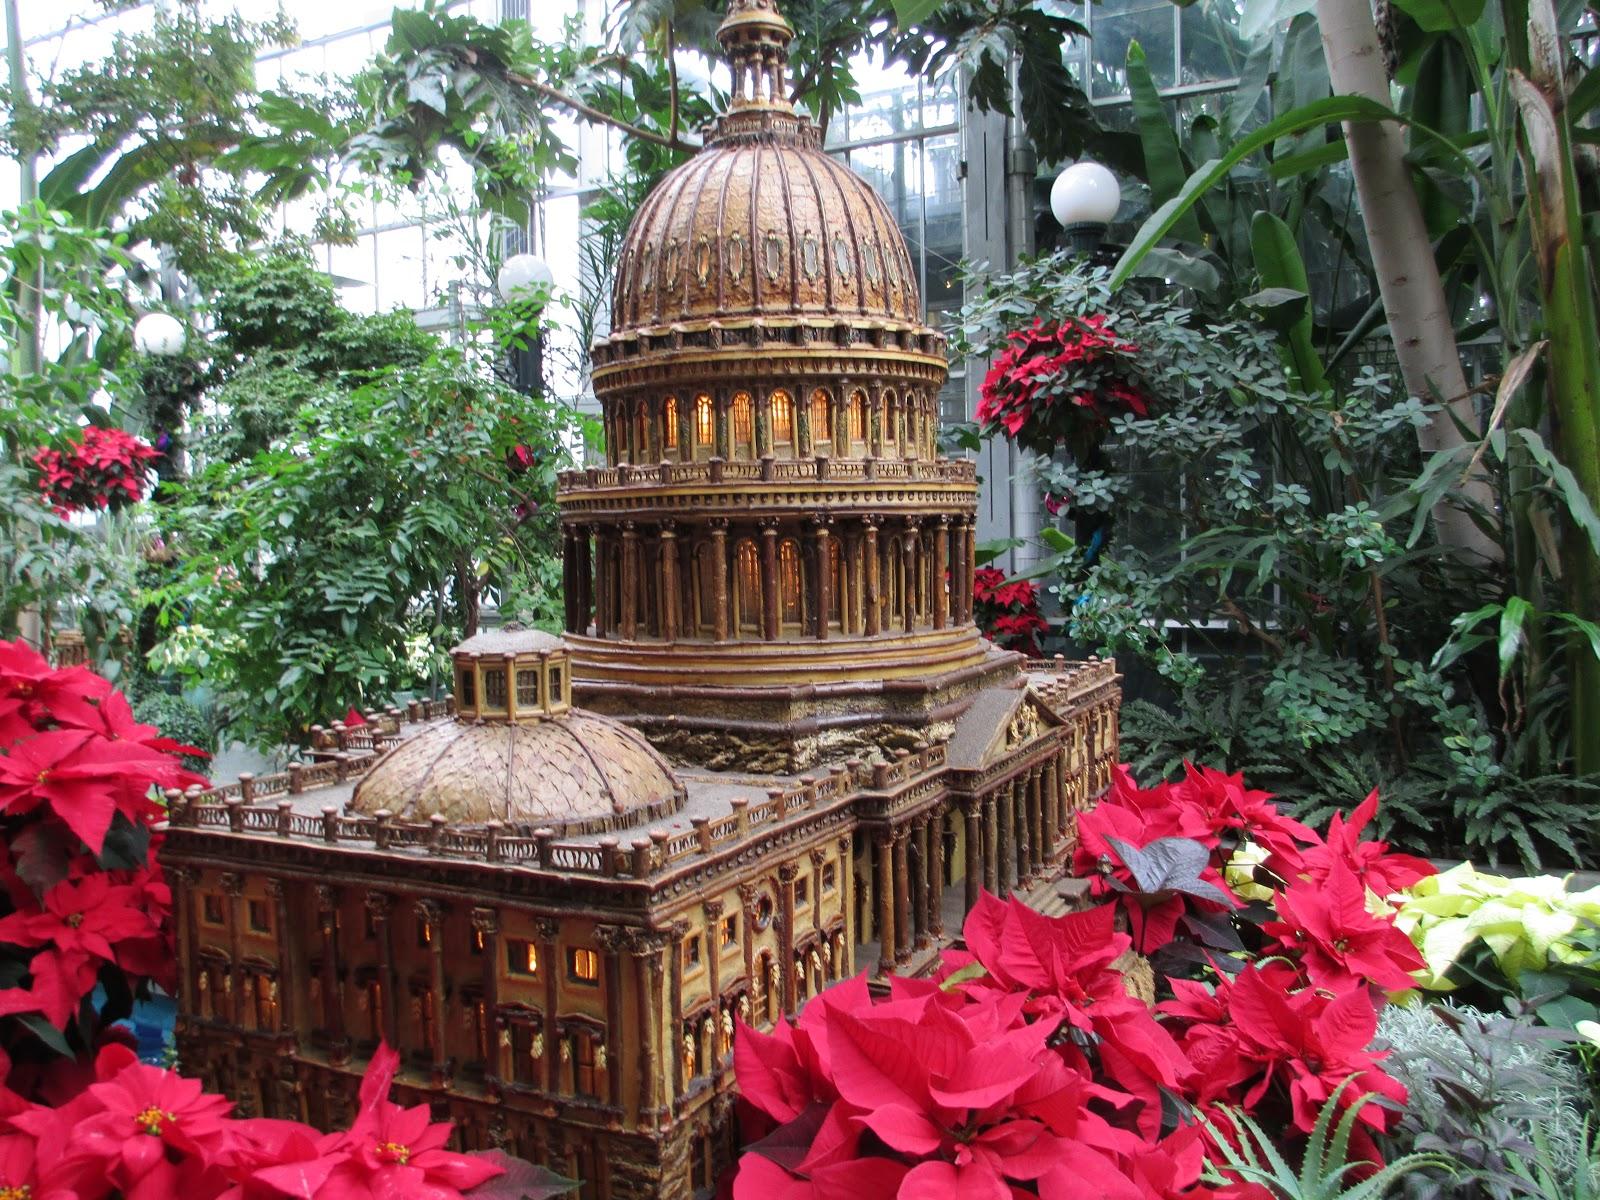 The Lernier Family Botanical Gardens Washington Dc December 2012